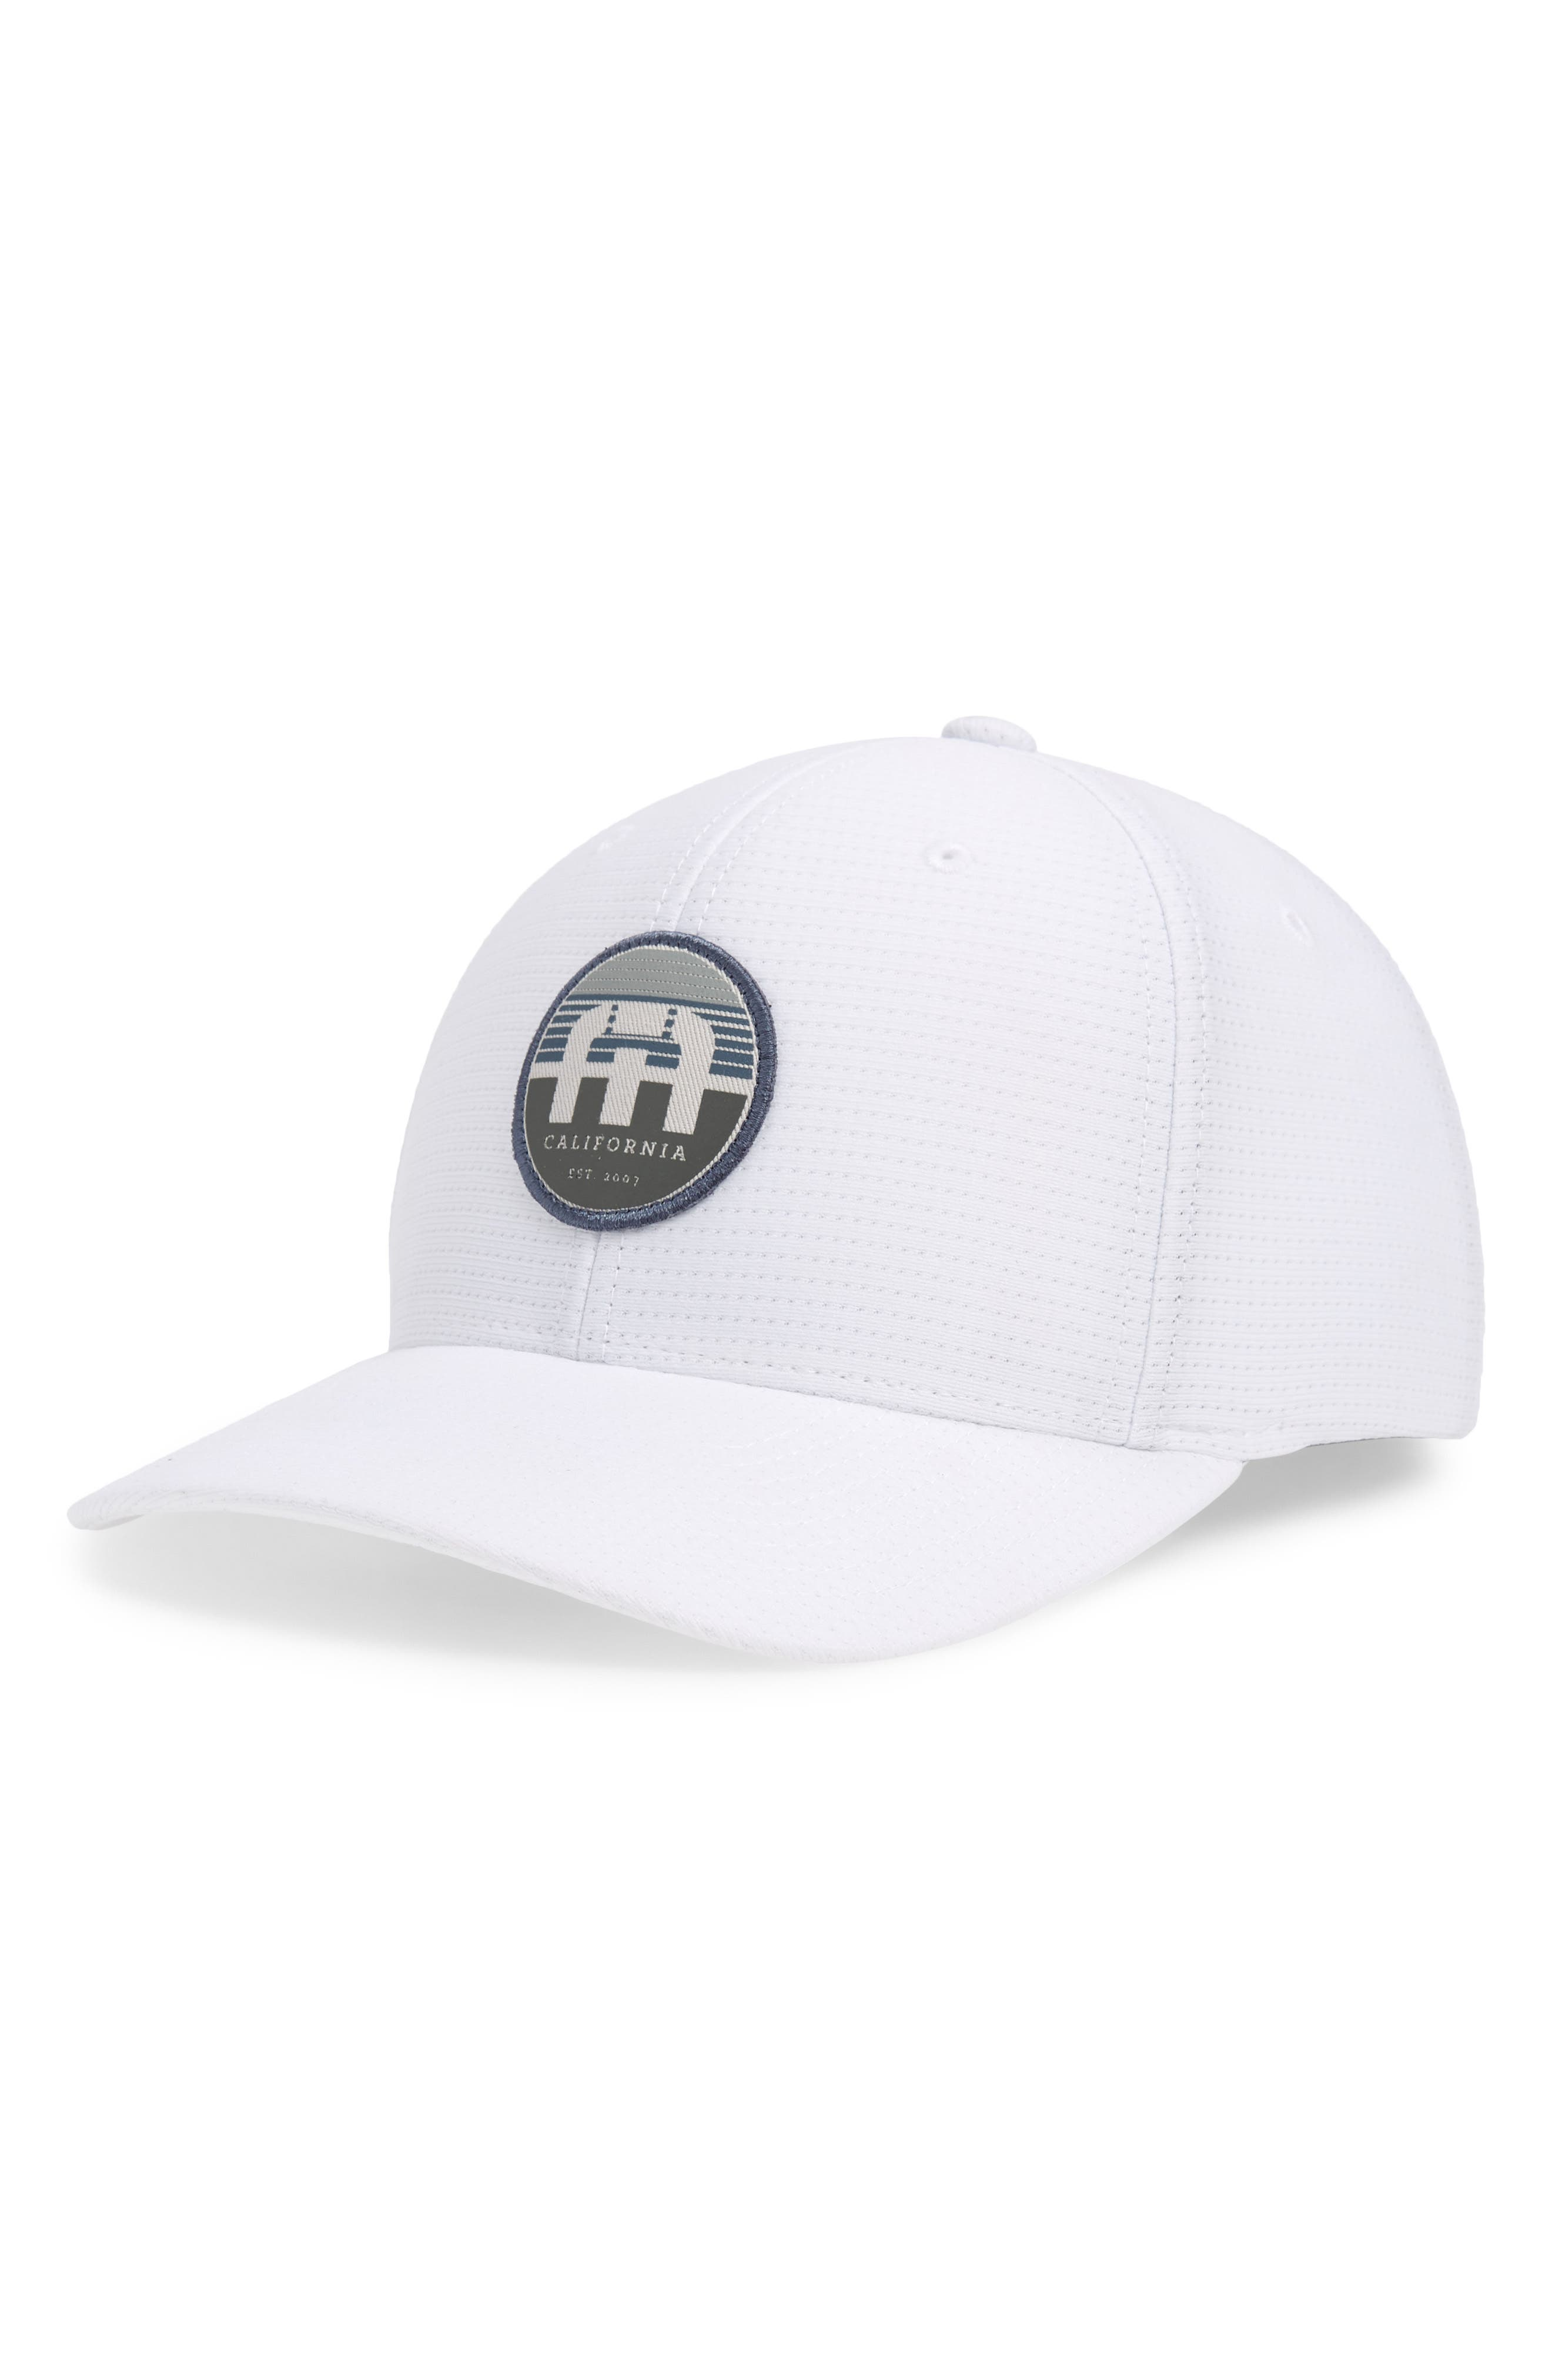 Septor Ball Cap,                             Main thumbnail 1, color,                             White